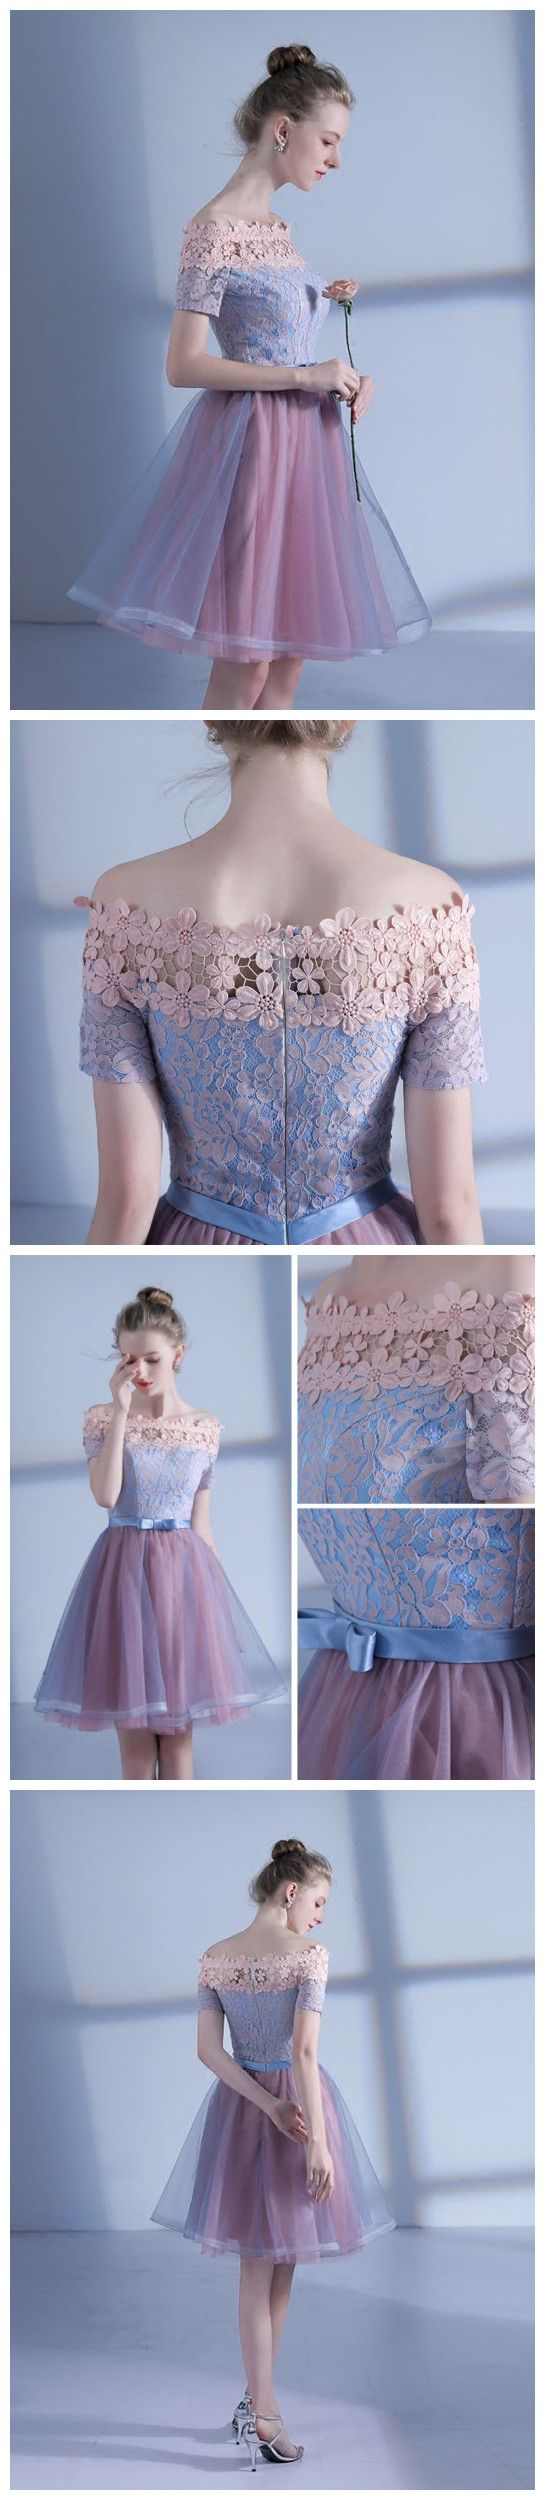 Charming homecoming dresses short aline offtheshoulder tulle